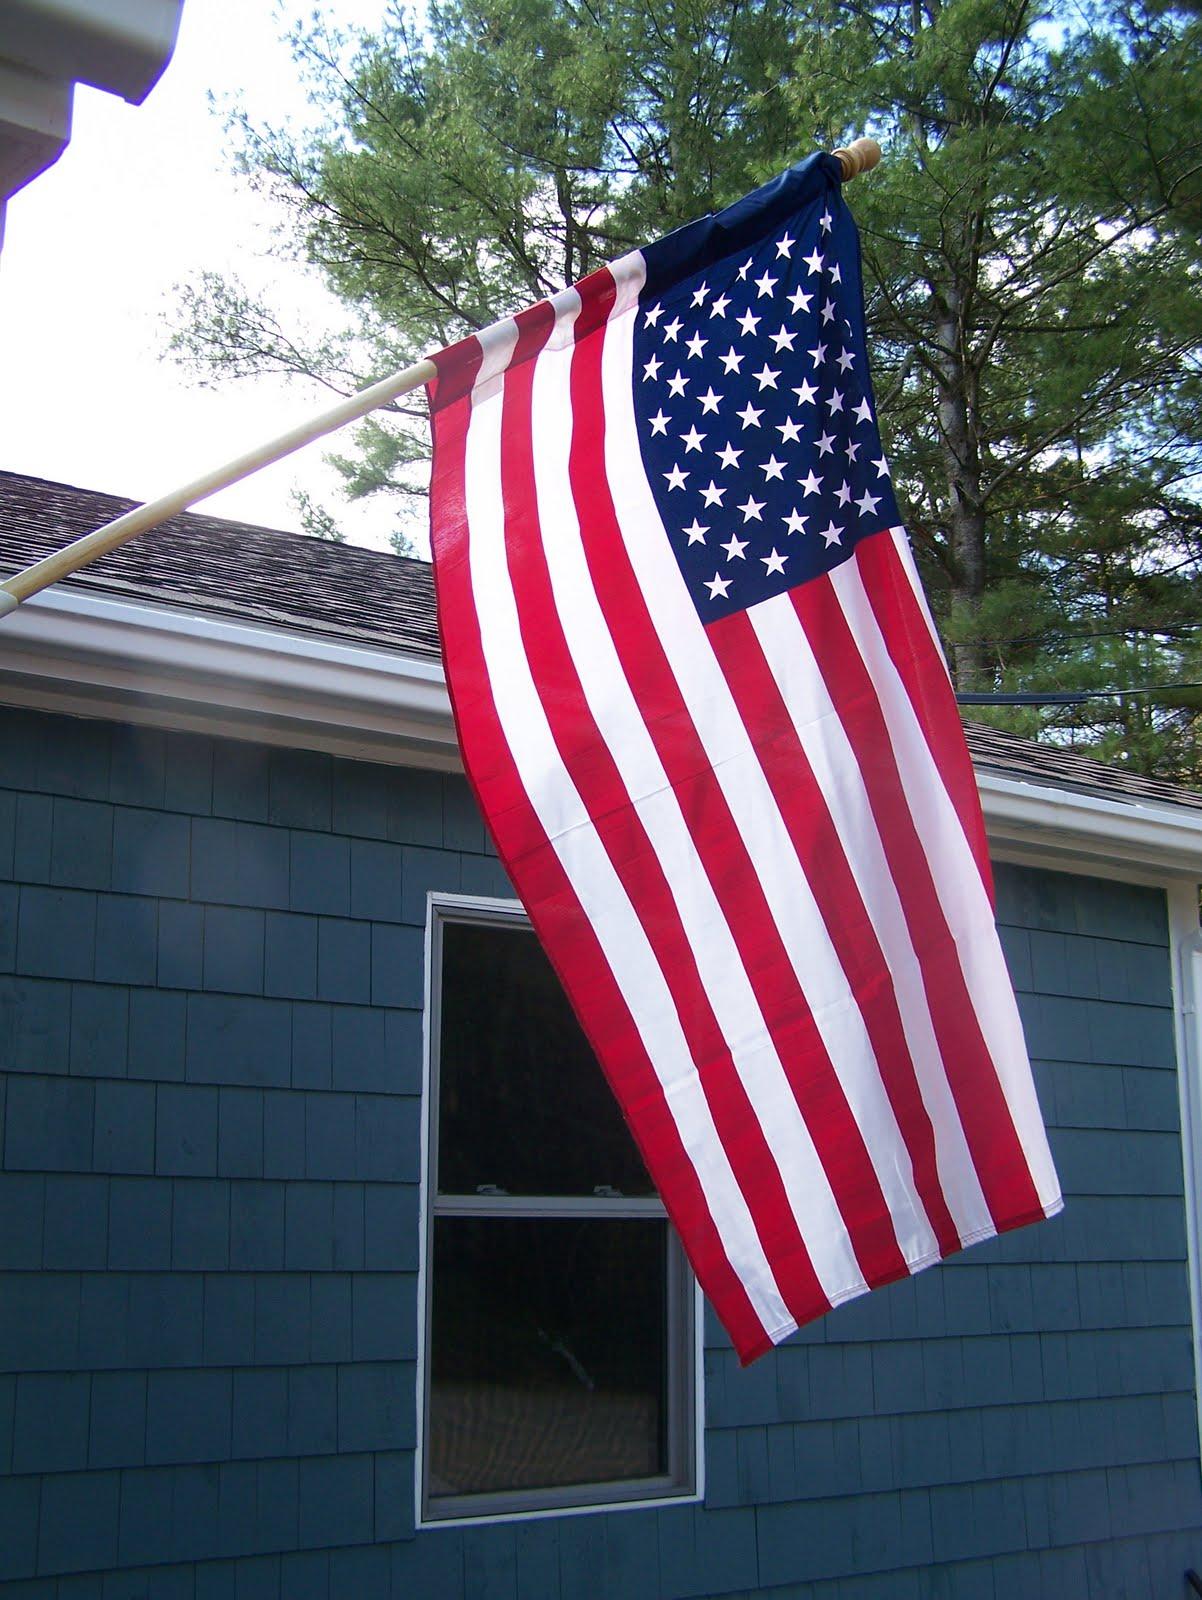 My American flag on my porch